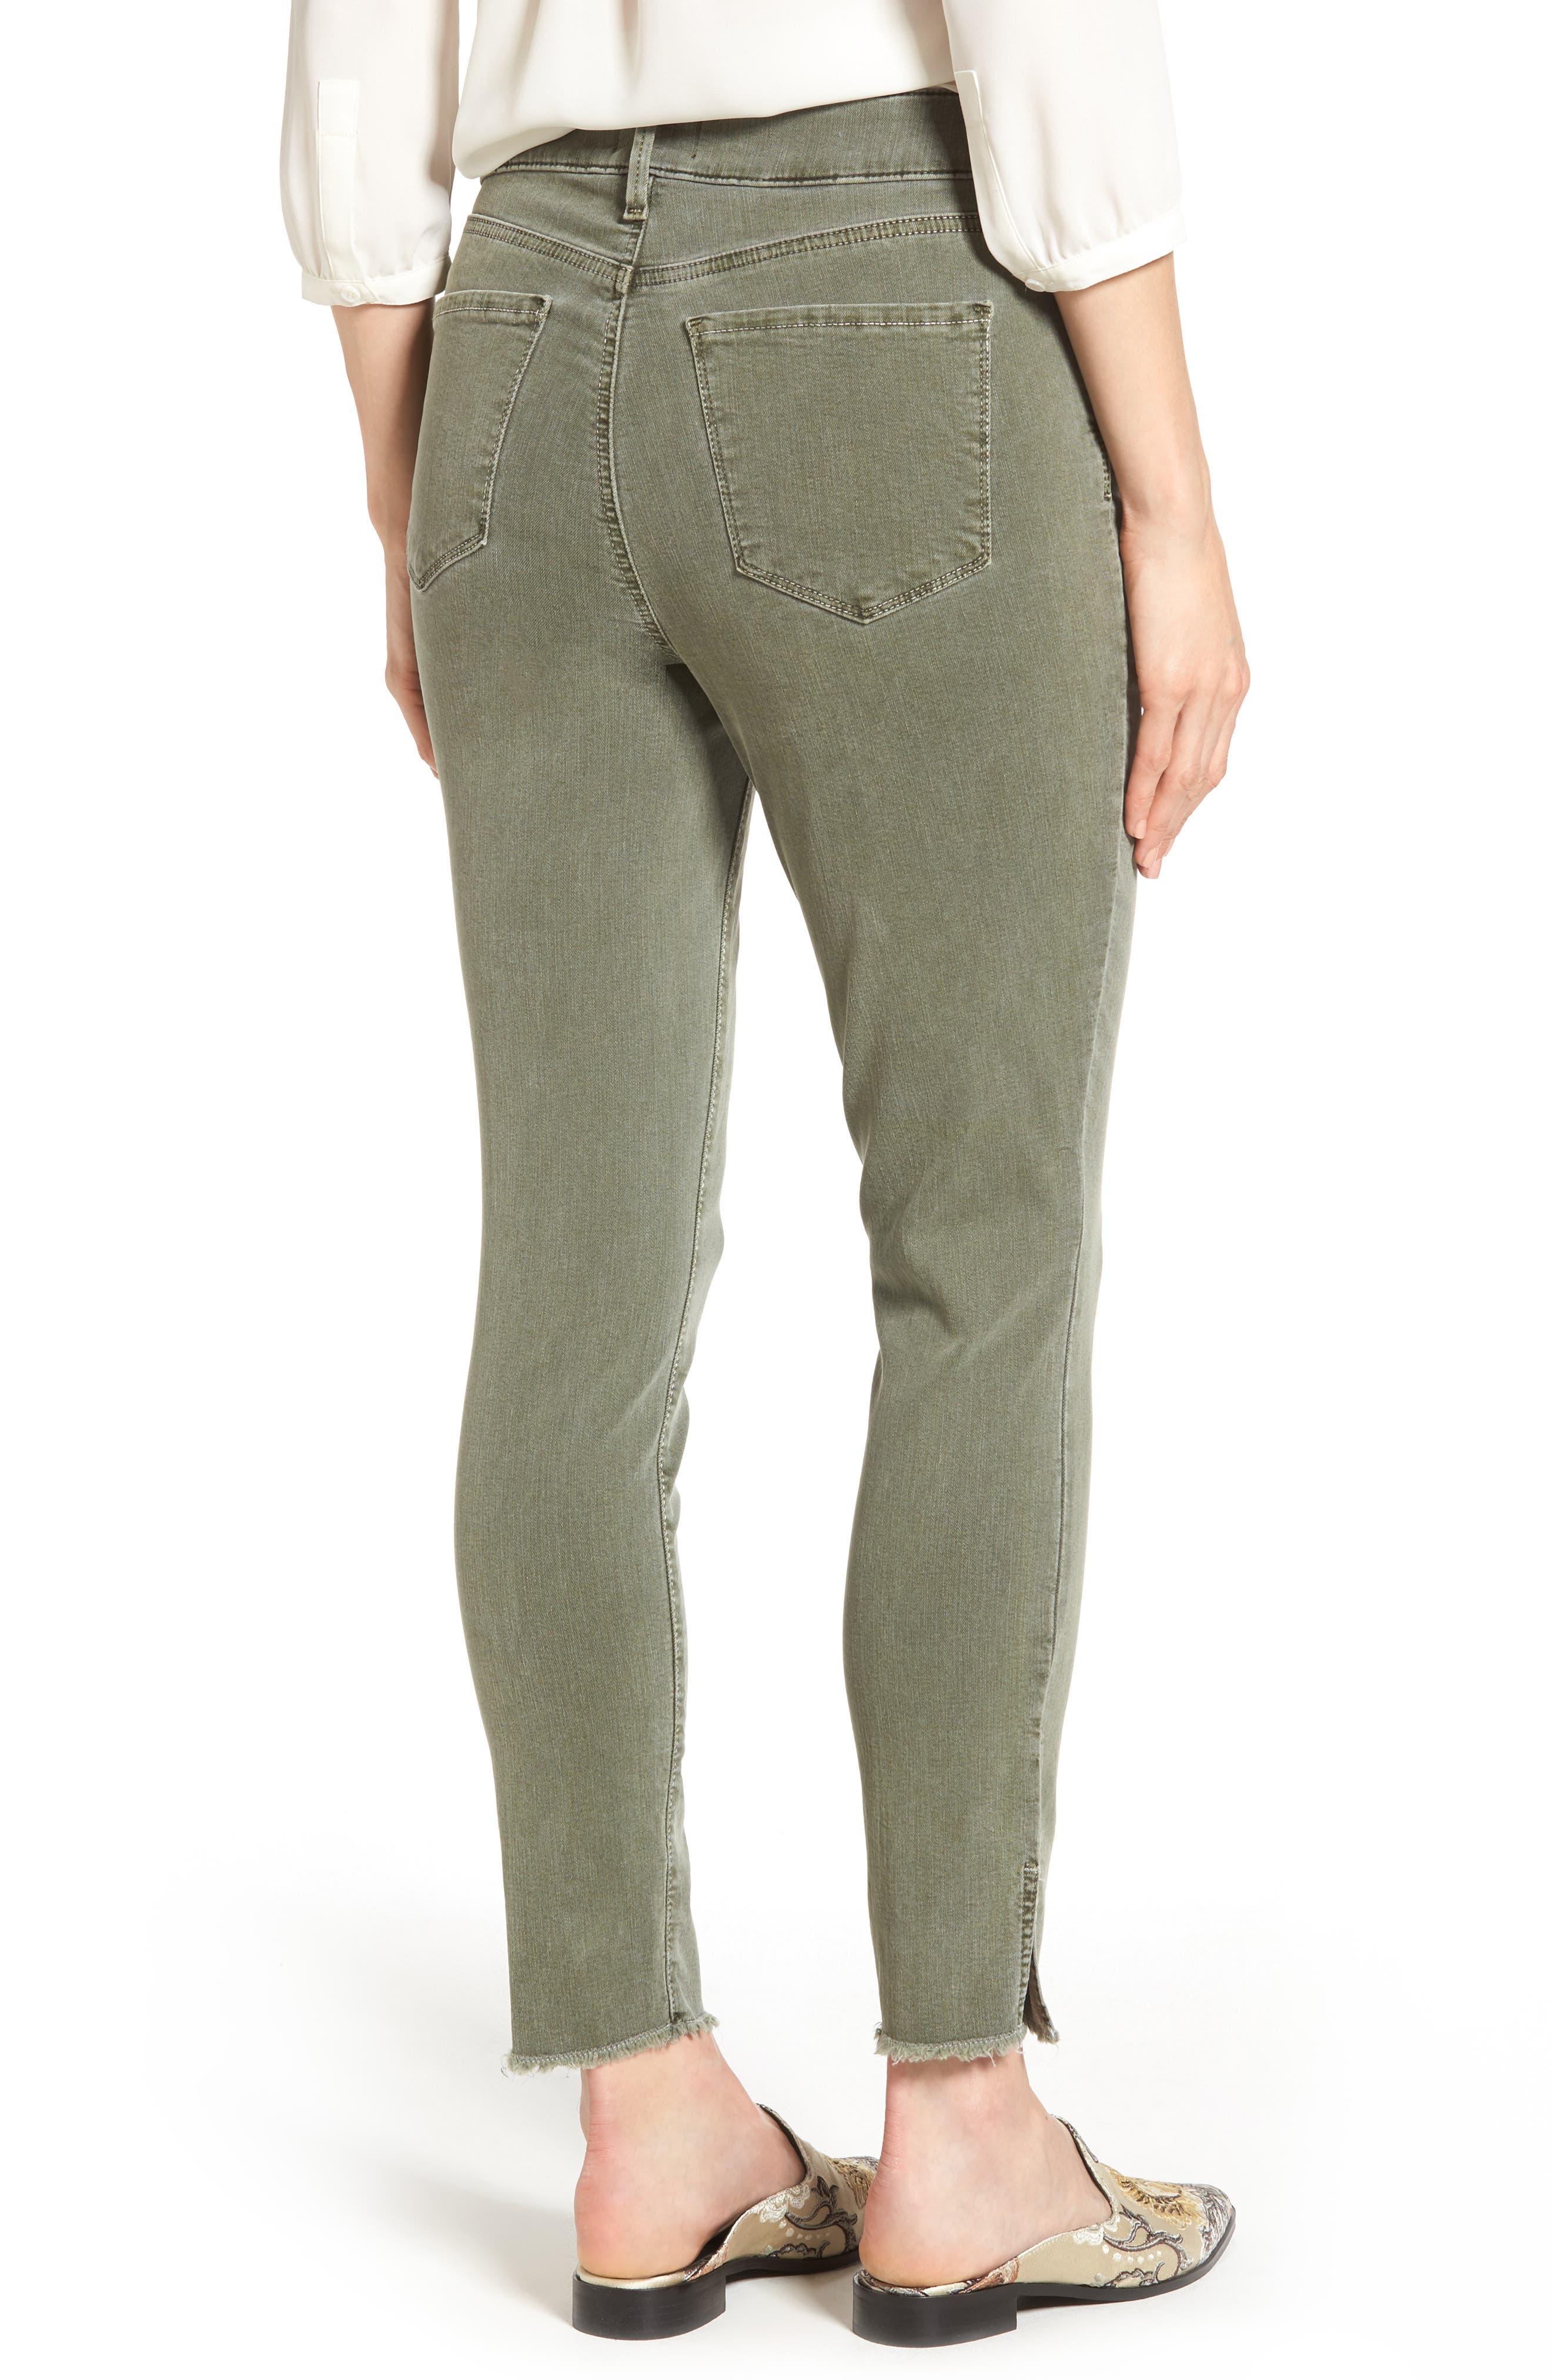 Alternate Image 2  - NYDJ Ami Frayed Hem Stretch Skinny Ankle Jeans (Regular & Petite)